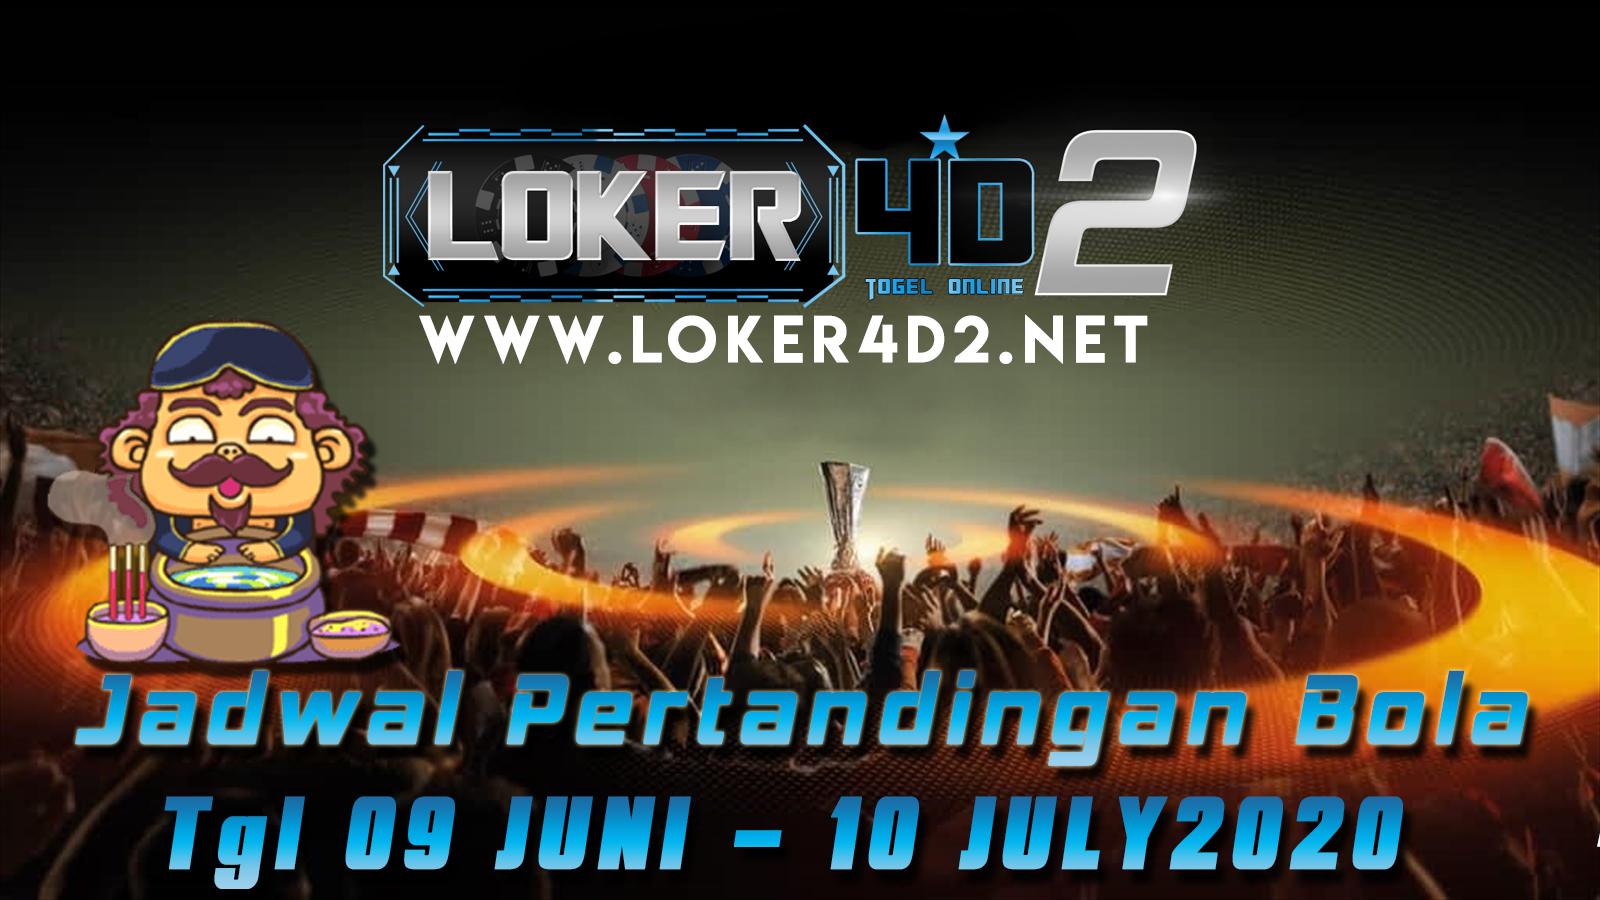 JADWAL PERTANDINGAN BOLA 09-10 JULI 2020